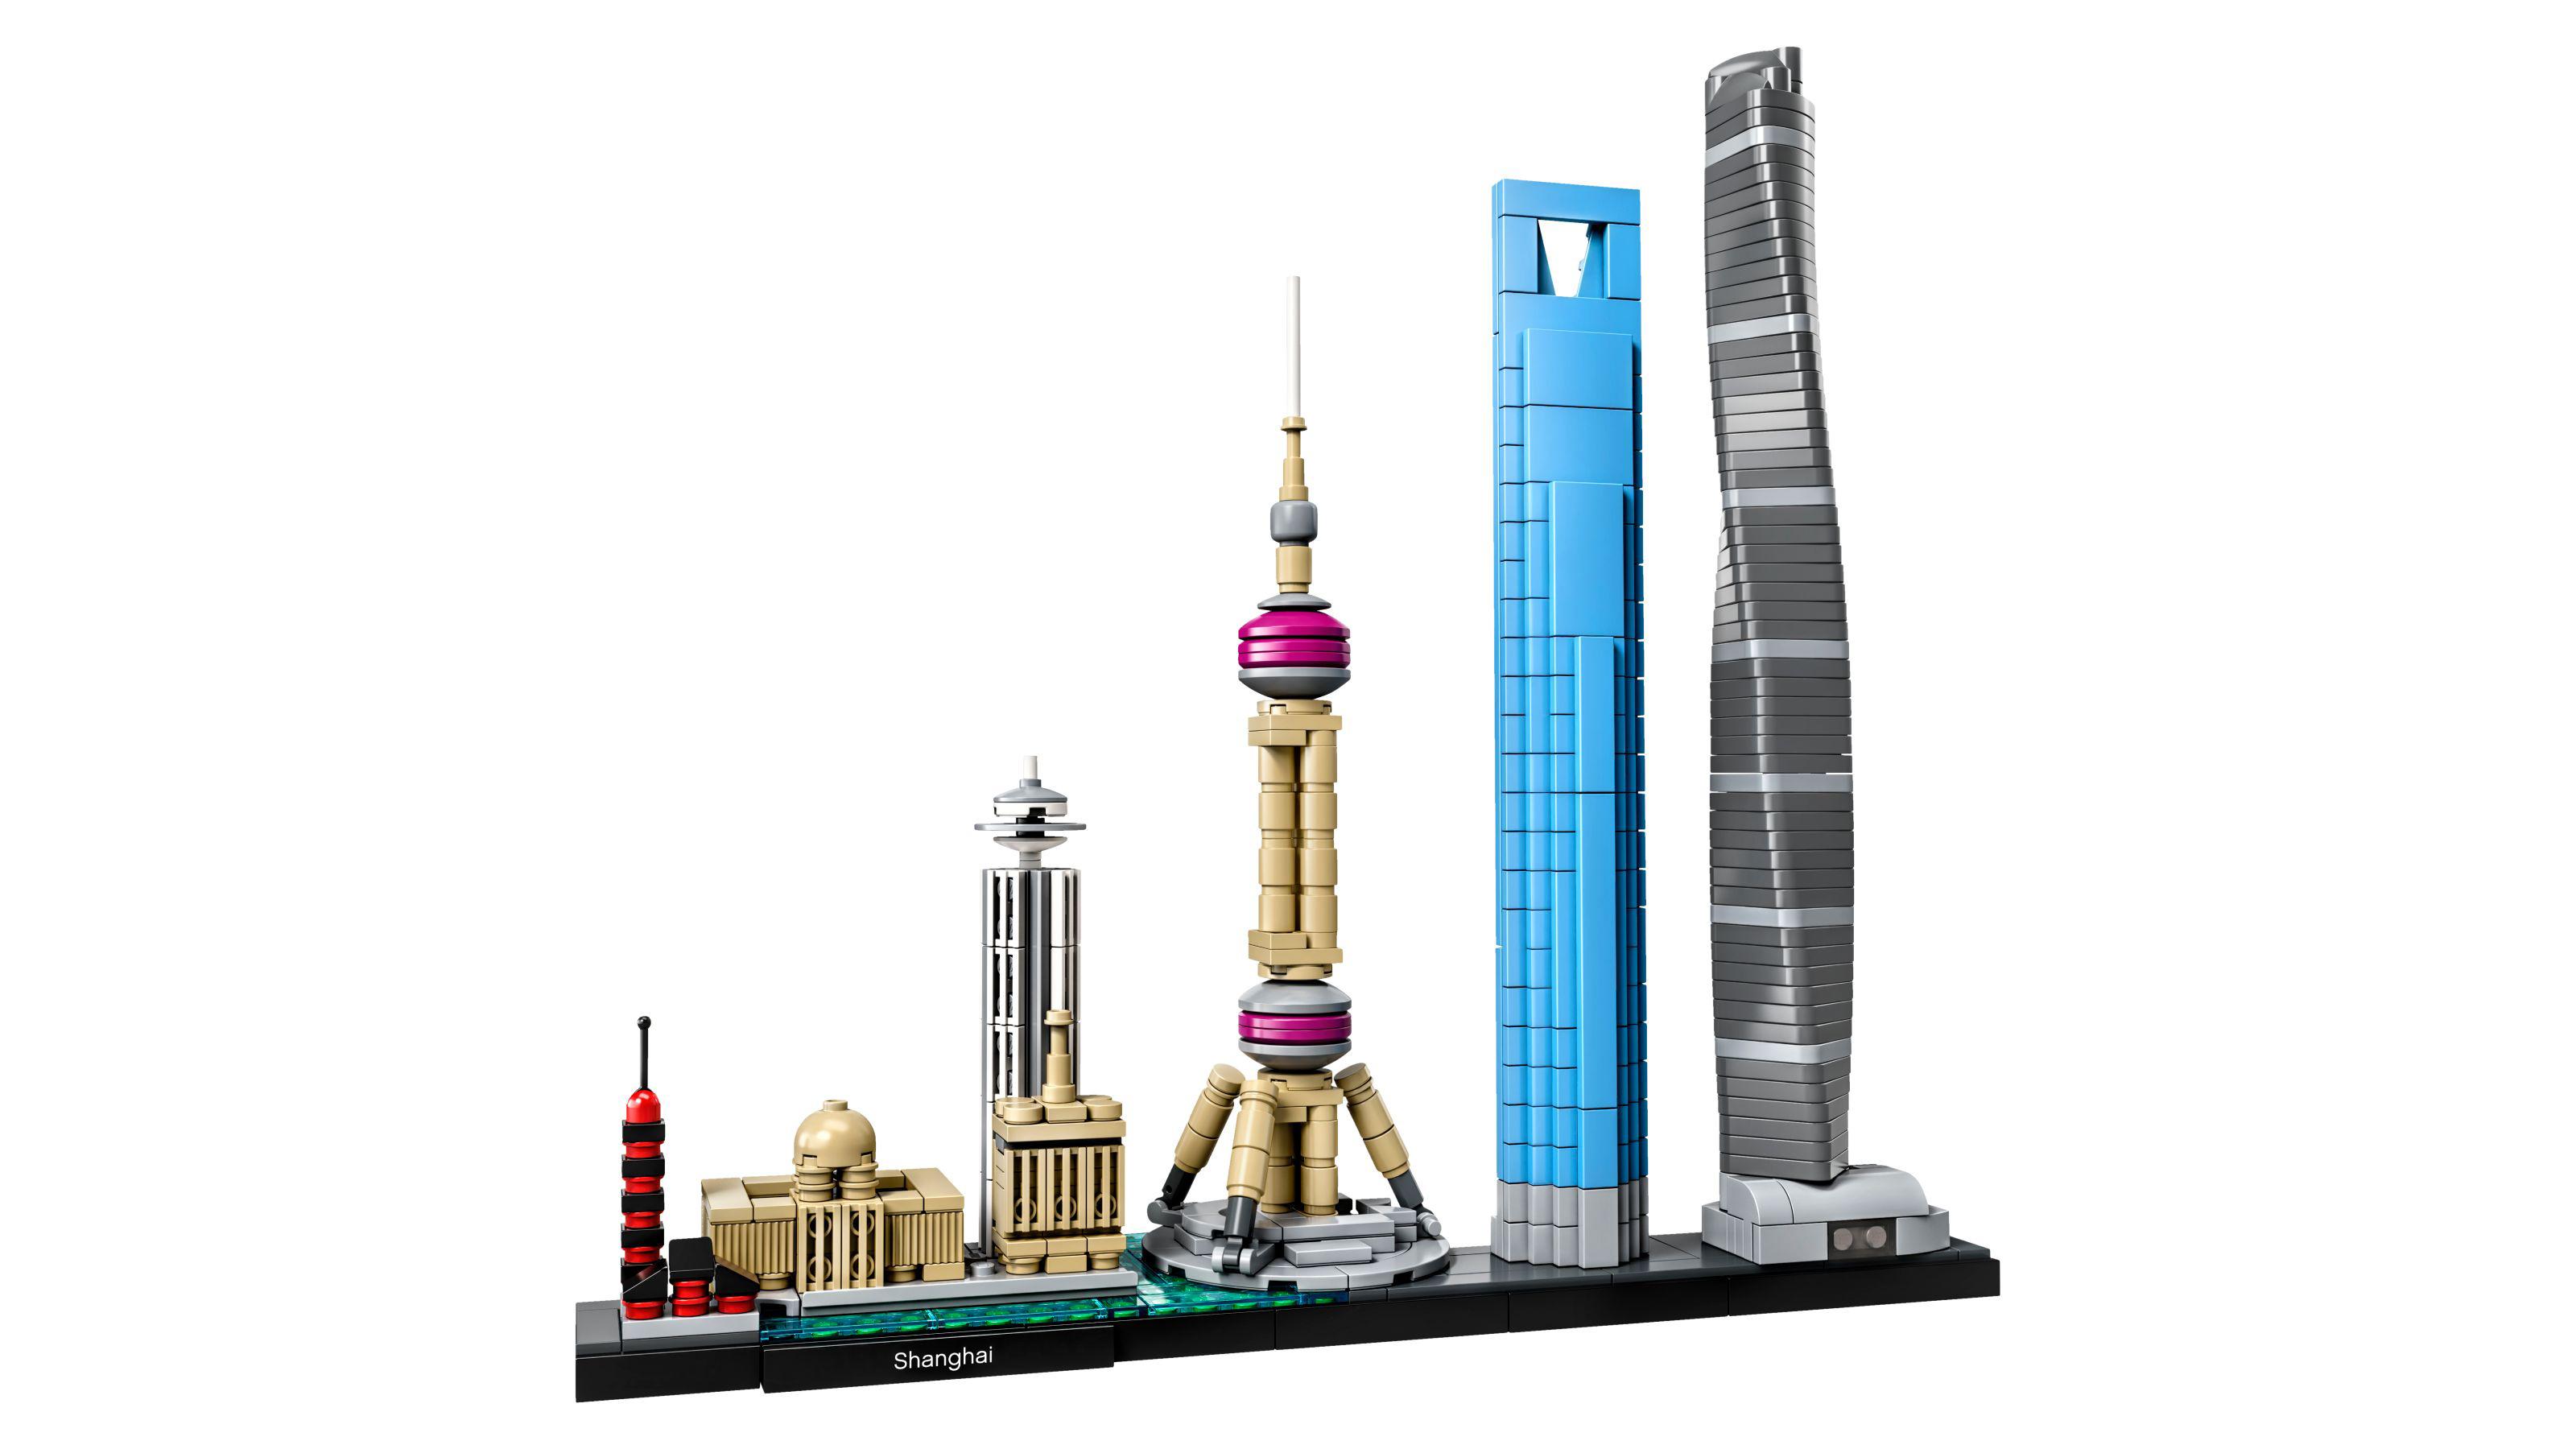 Best Lego Architecture sets: Shanghai